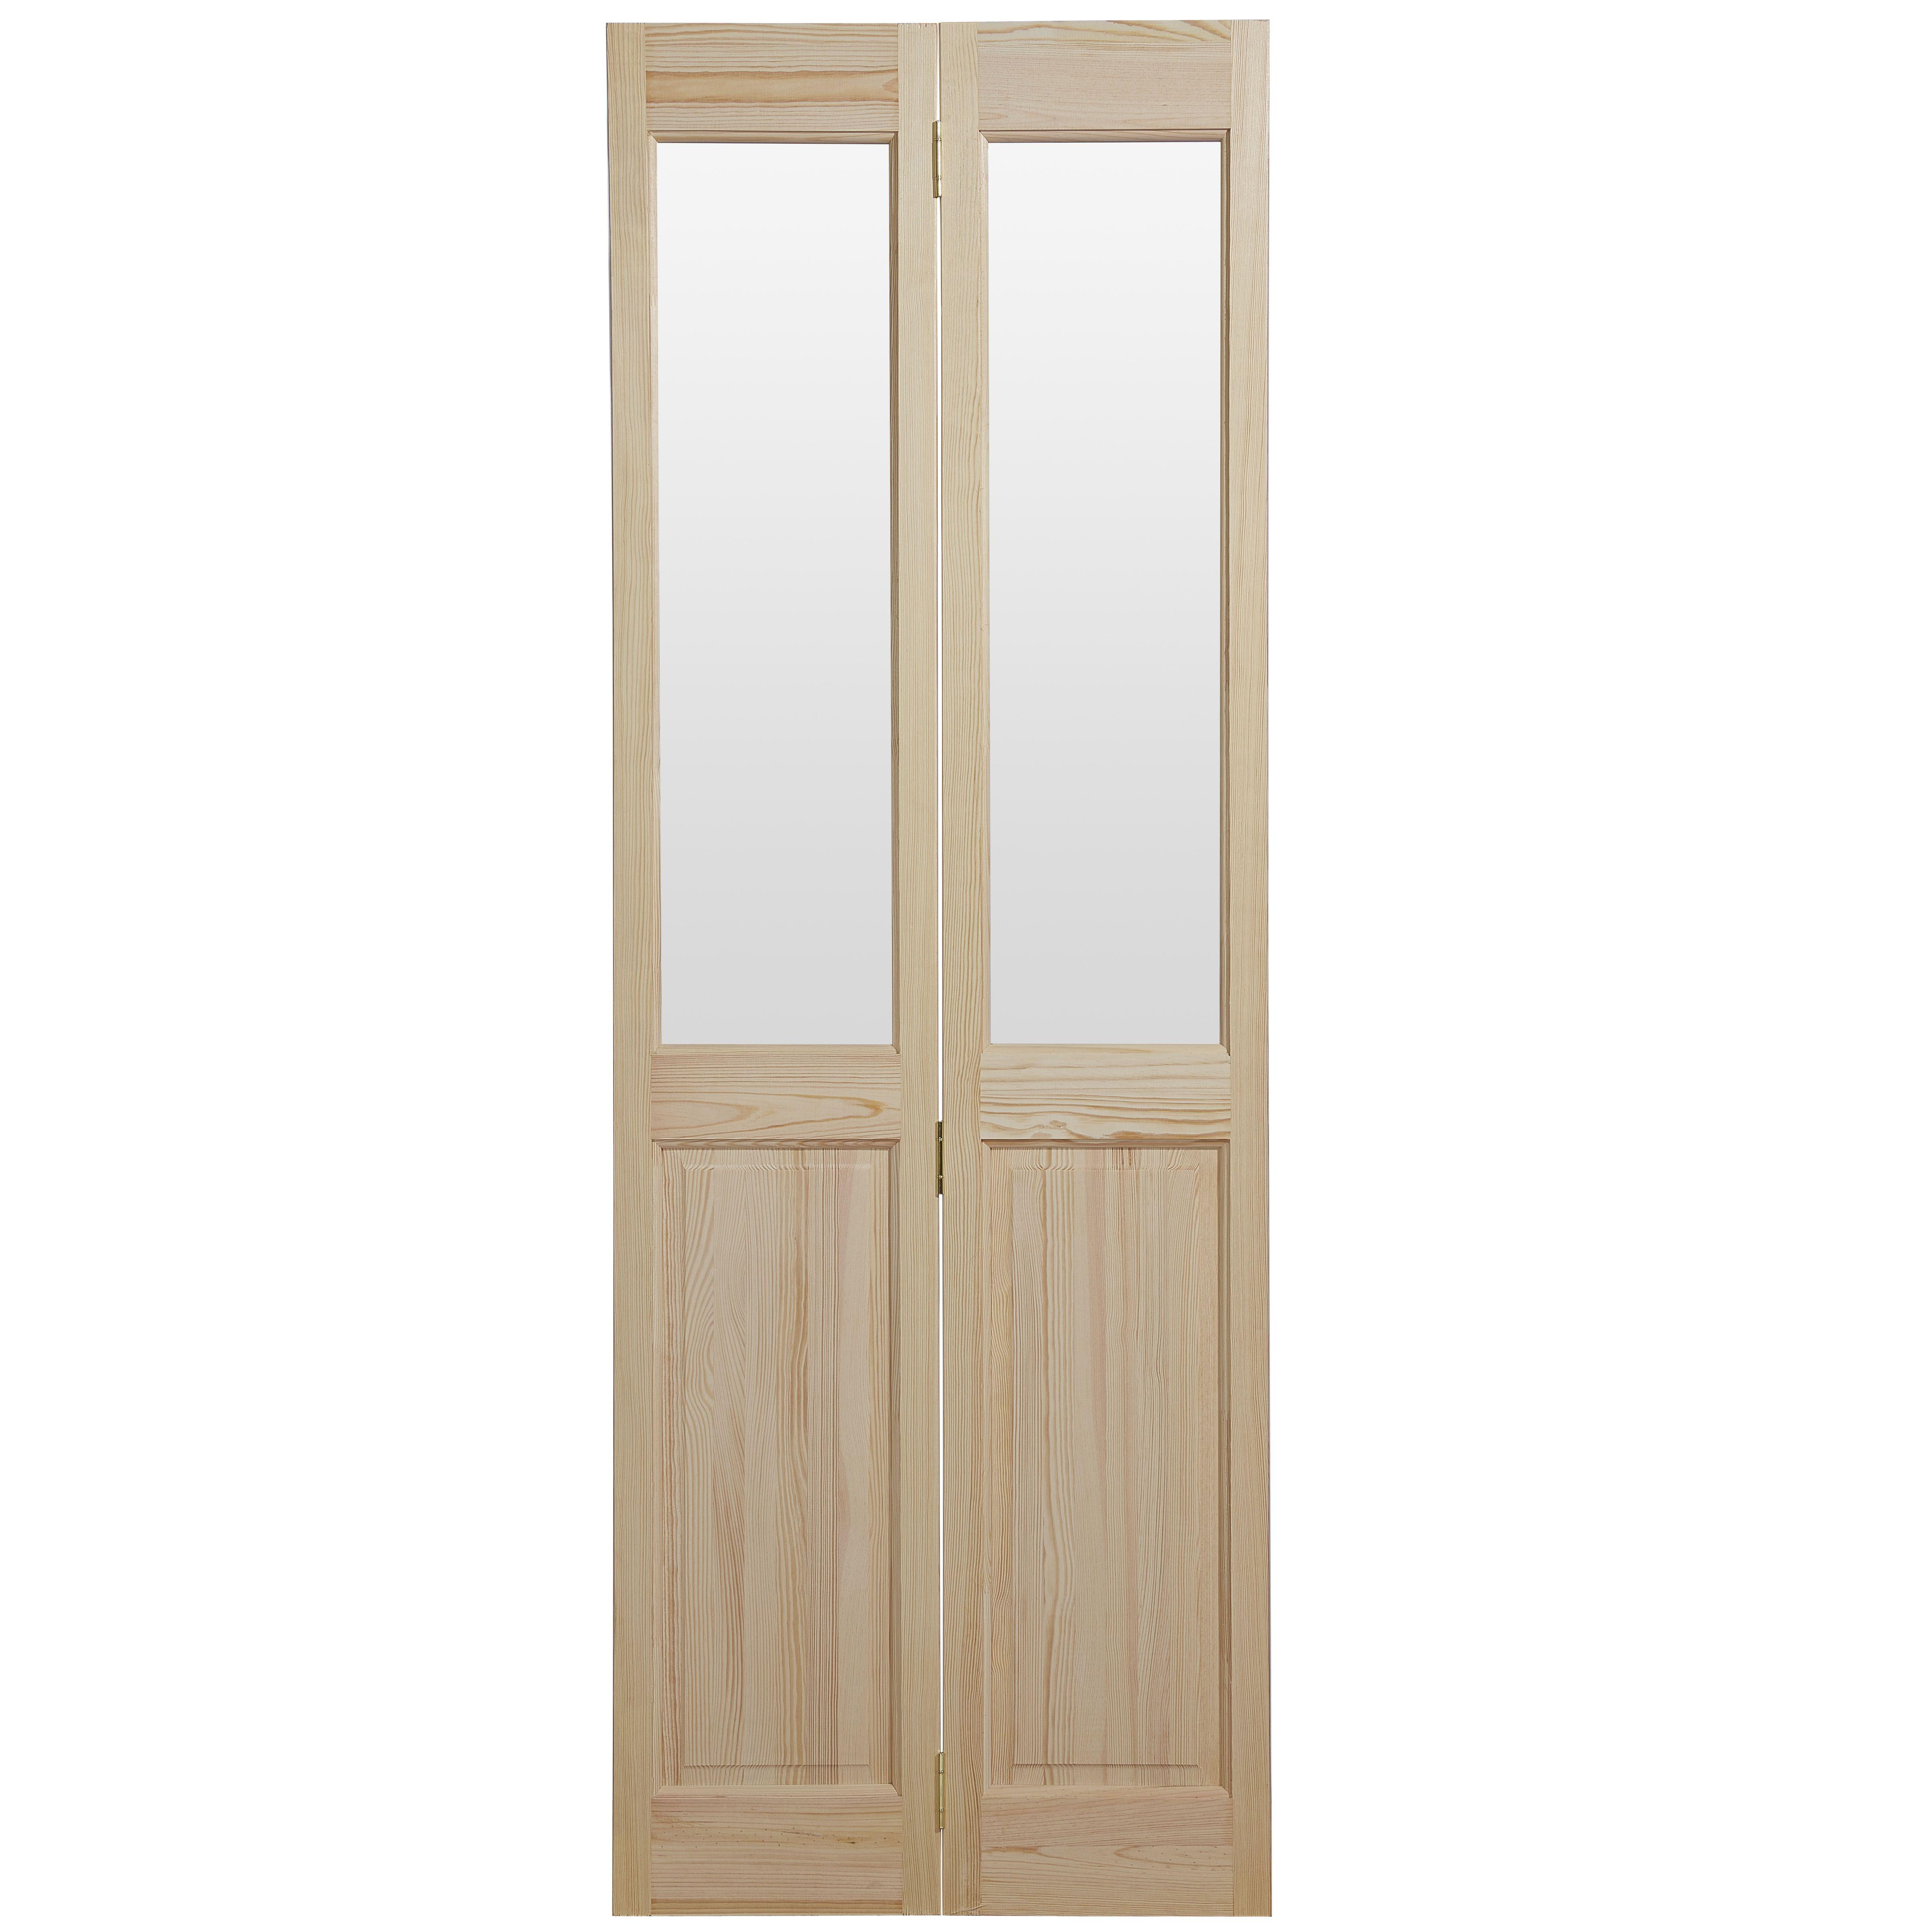 15 lite knotty pine internal glazed door h 1981mm w for 15 panel glazed internal door